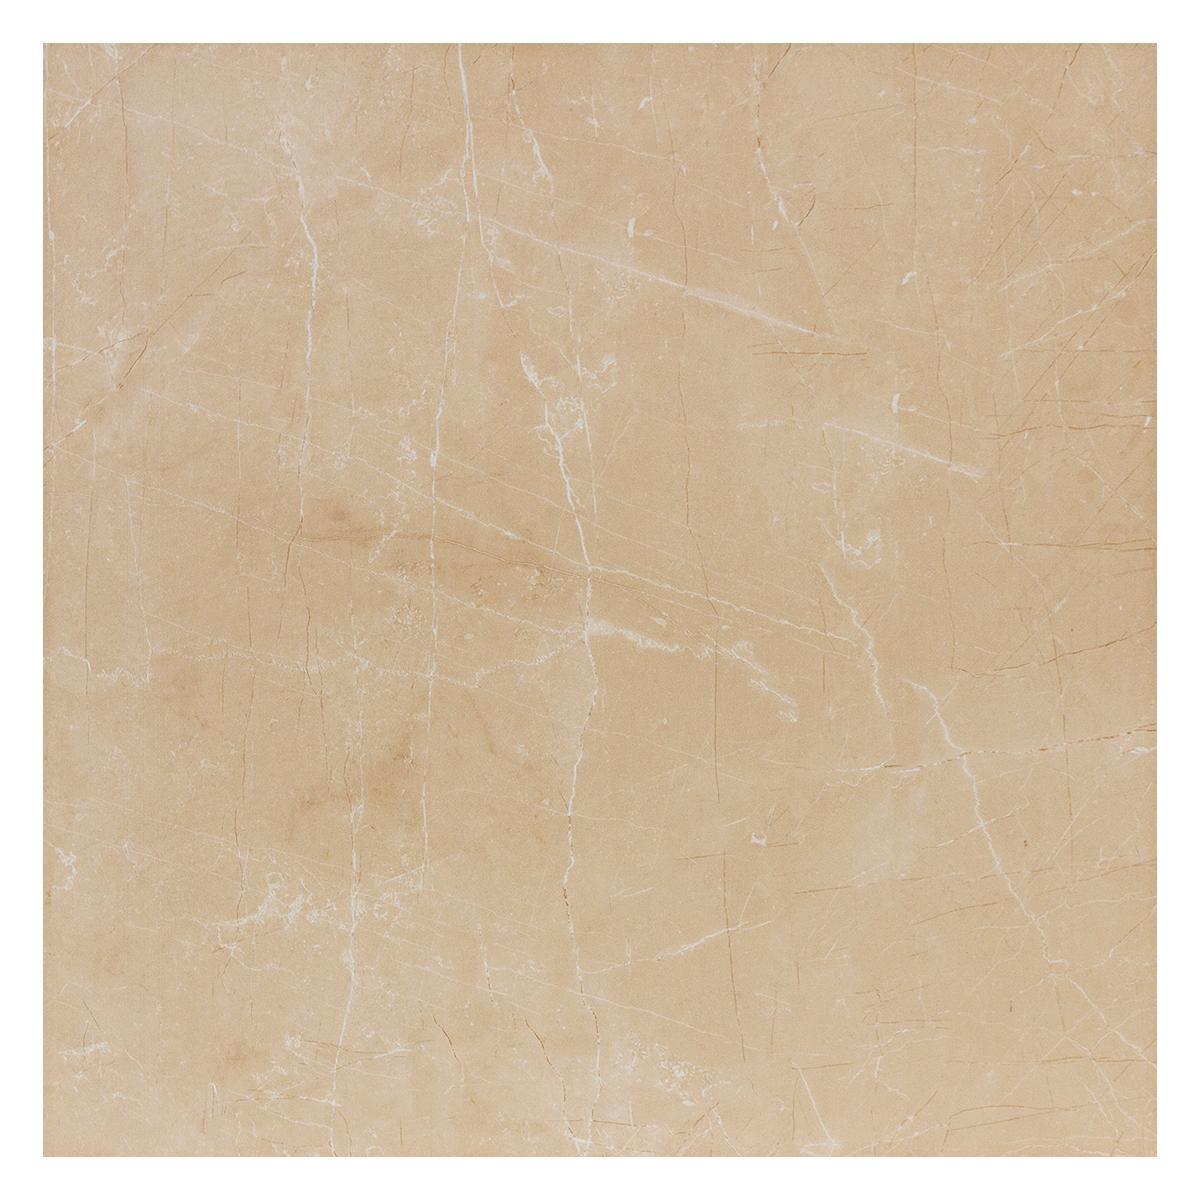 Porcelanato Agatta Beige Satinado - 60X60 cm - 1.44 m2